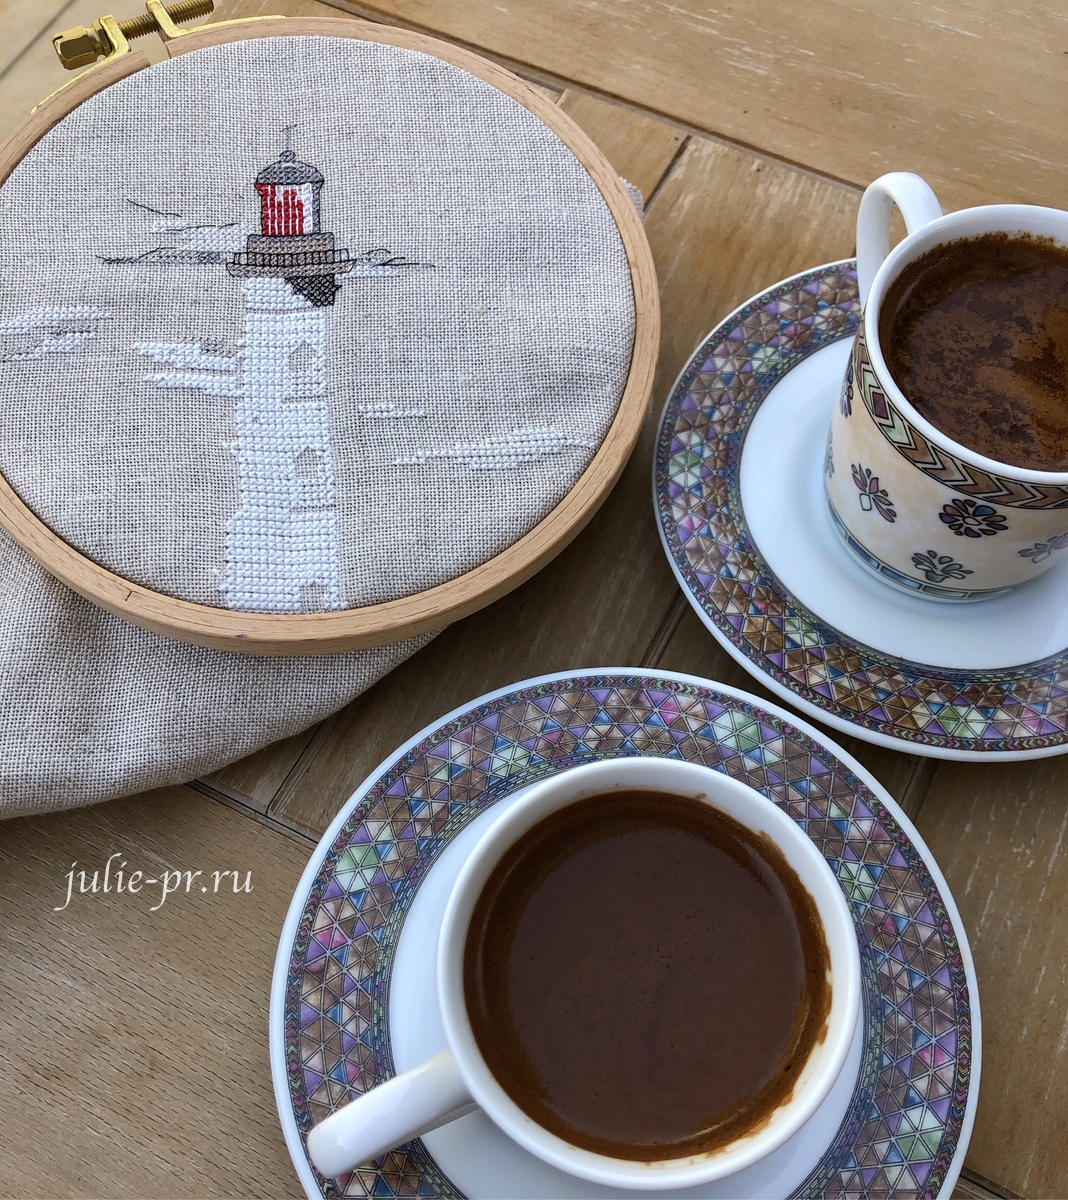 Soizic, Le Phare des Rois, Кордуанский маяк, Phare de Cordouan, вышивка крестом, кофе по-турецки, белый маяк